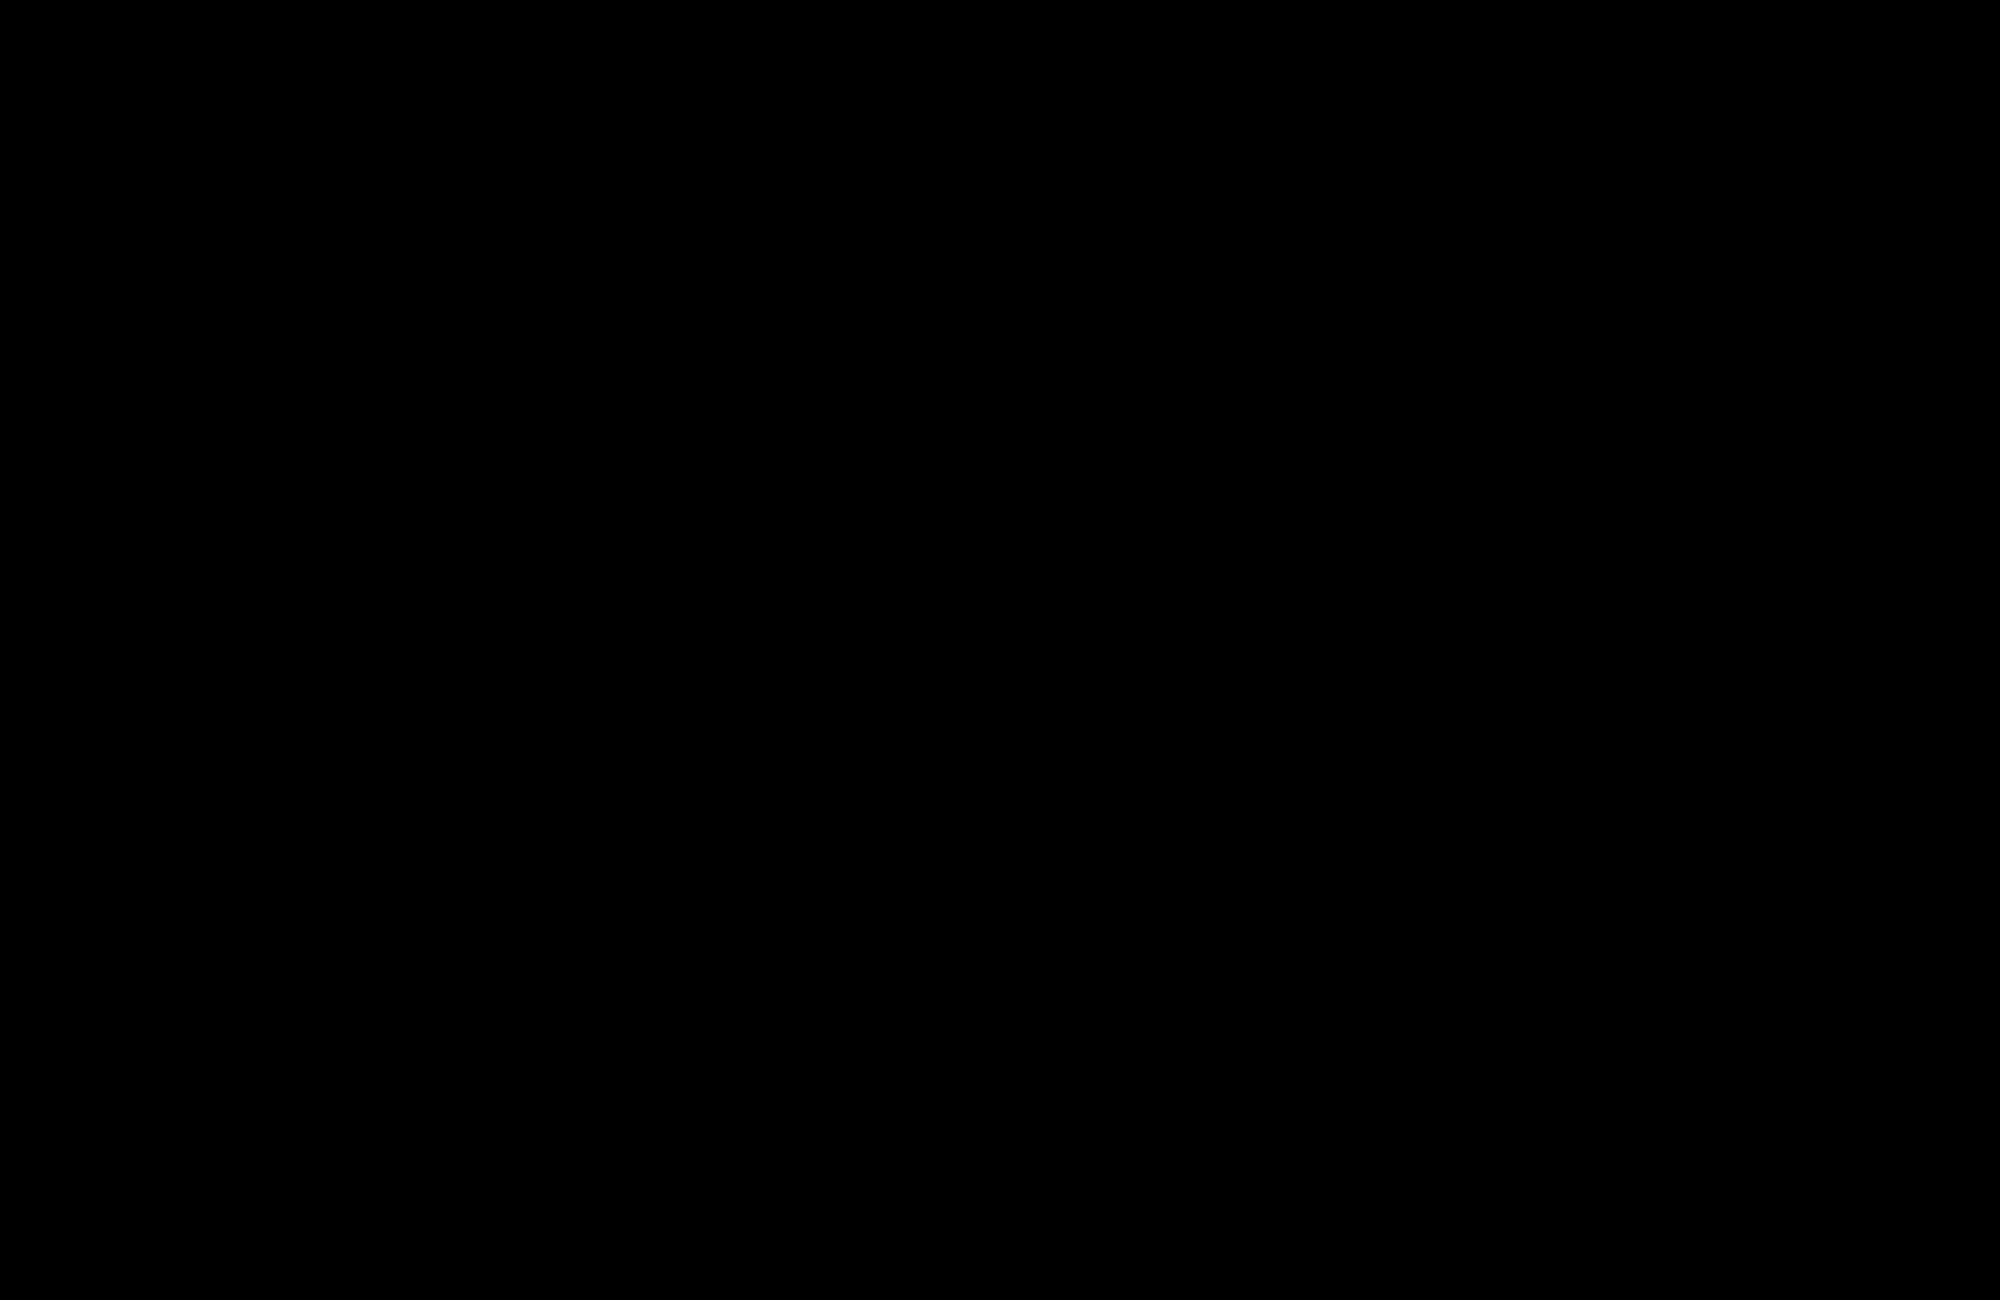 EXM5N Neodymium Series Midrange Frequency Response